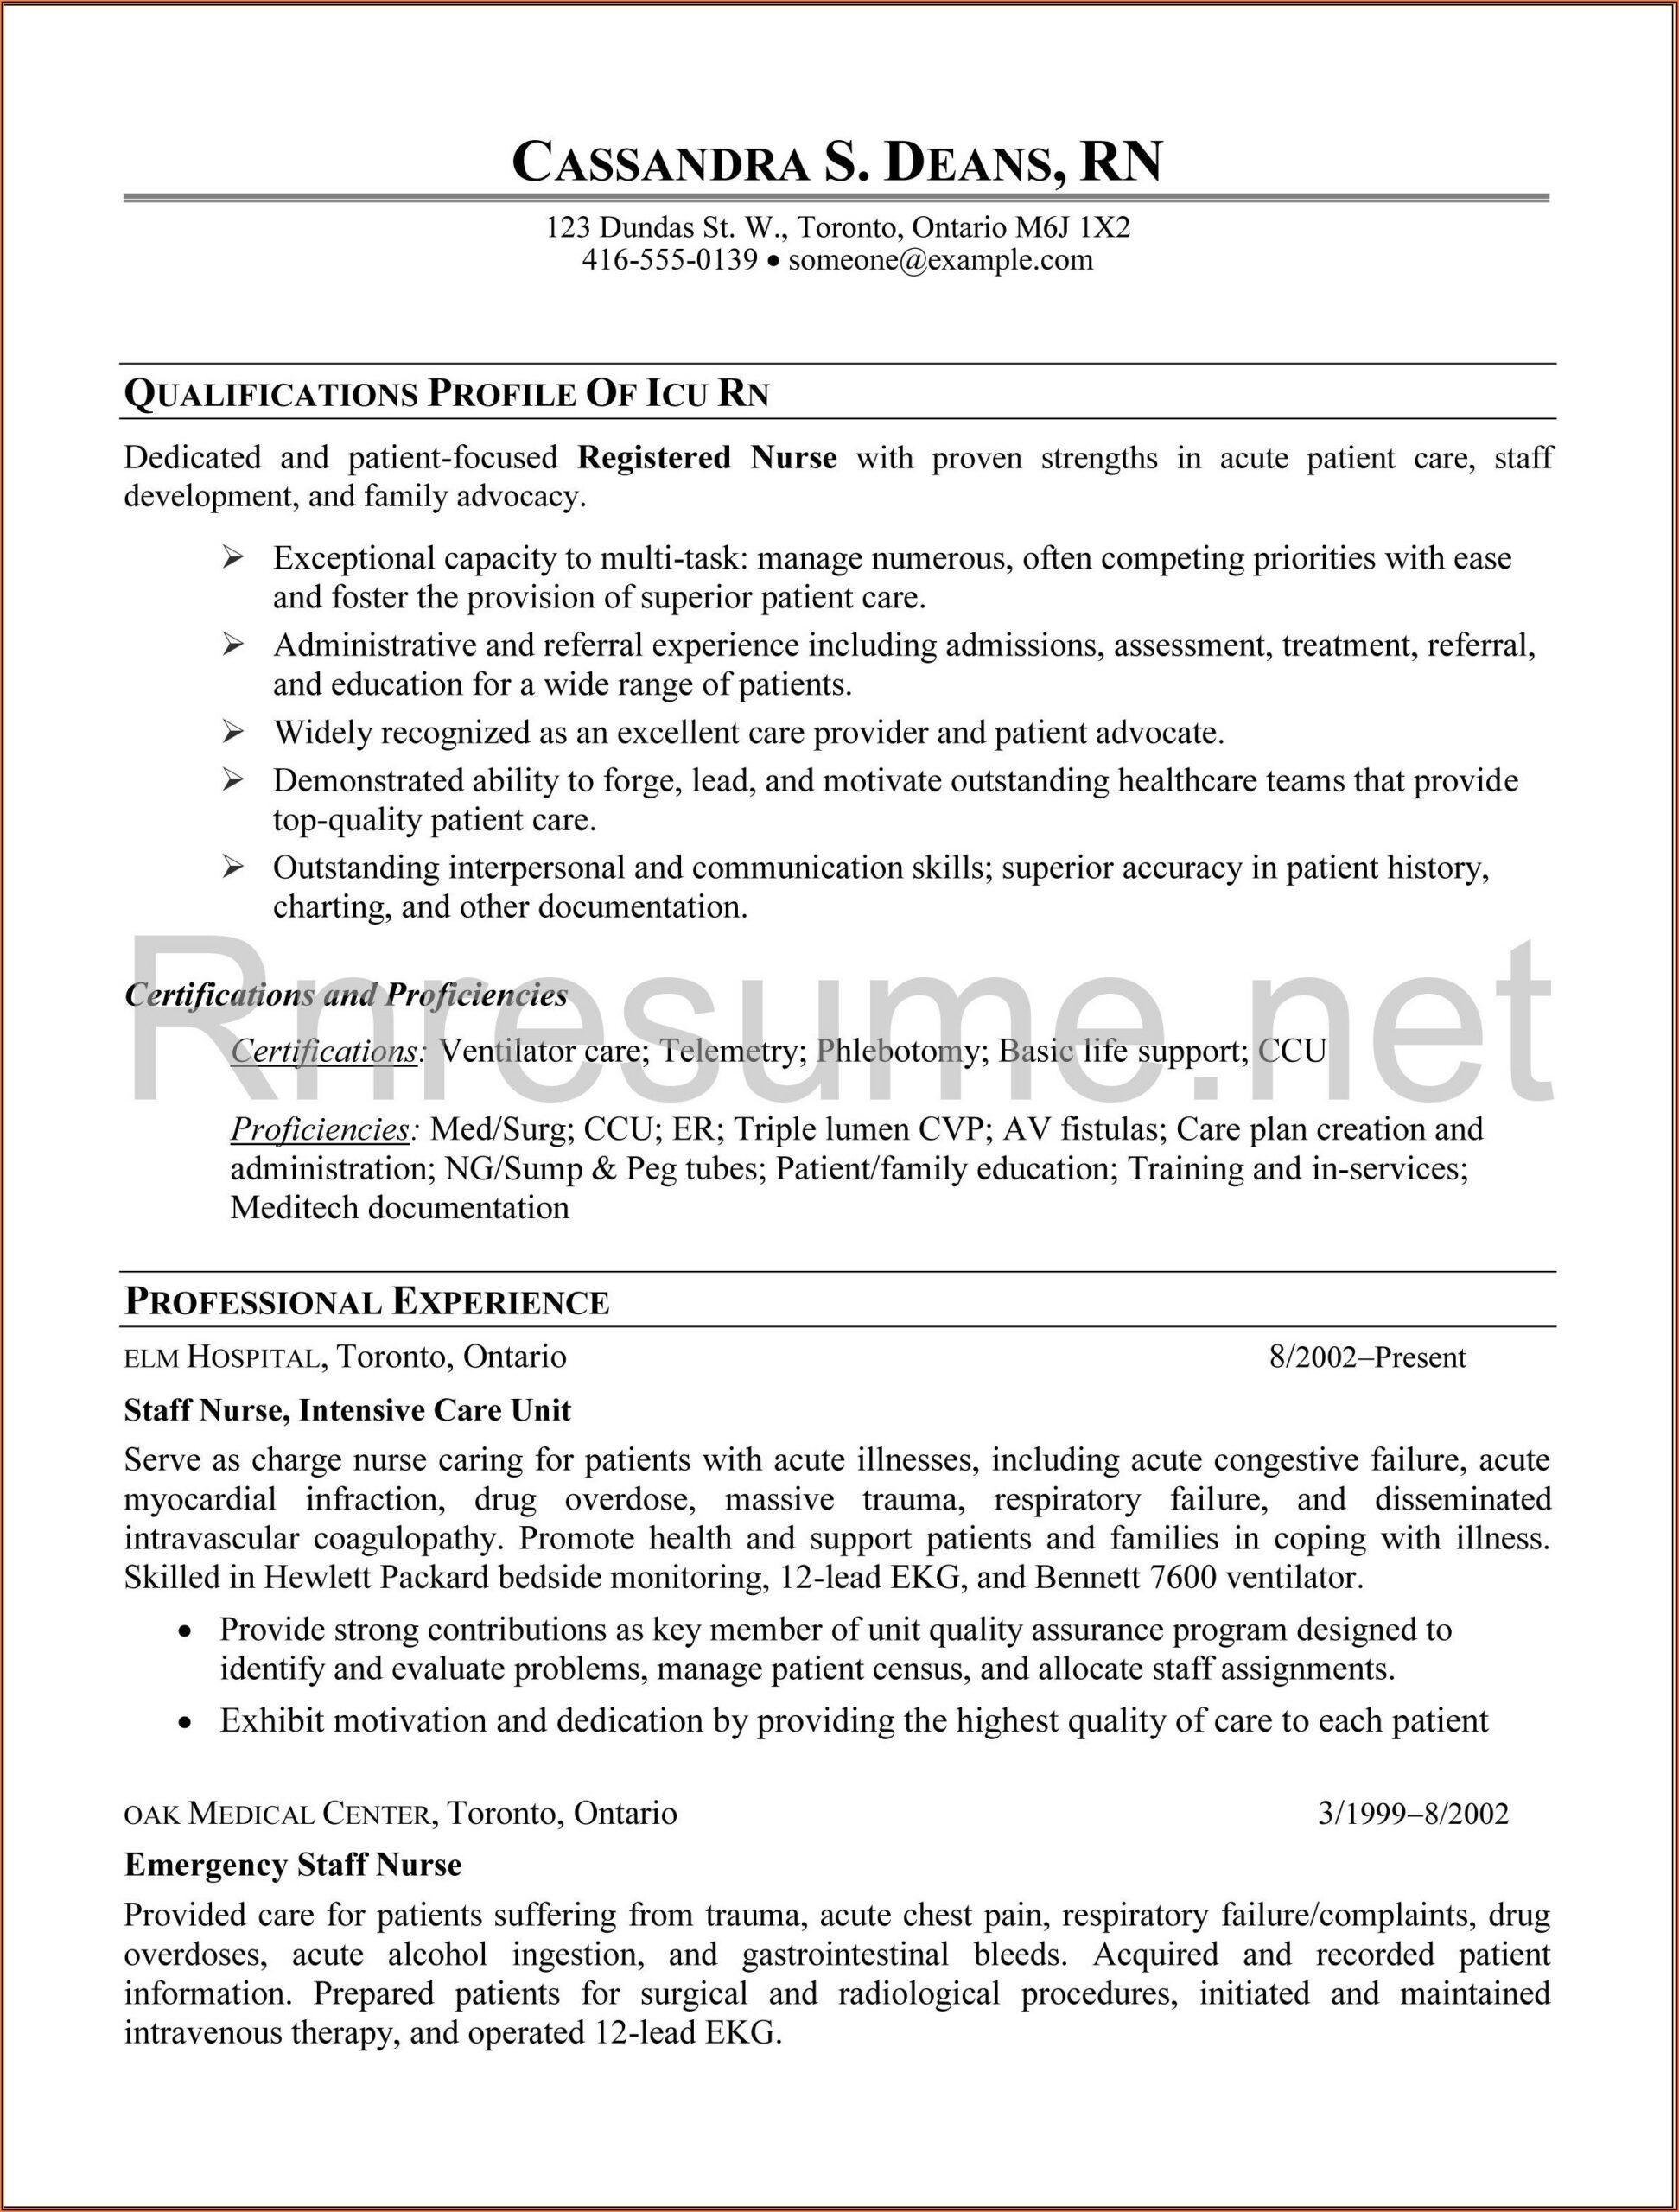 Nursing Resume Writing Services Perth